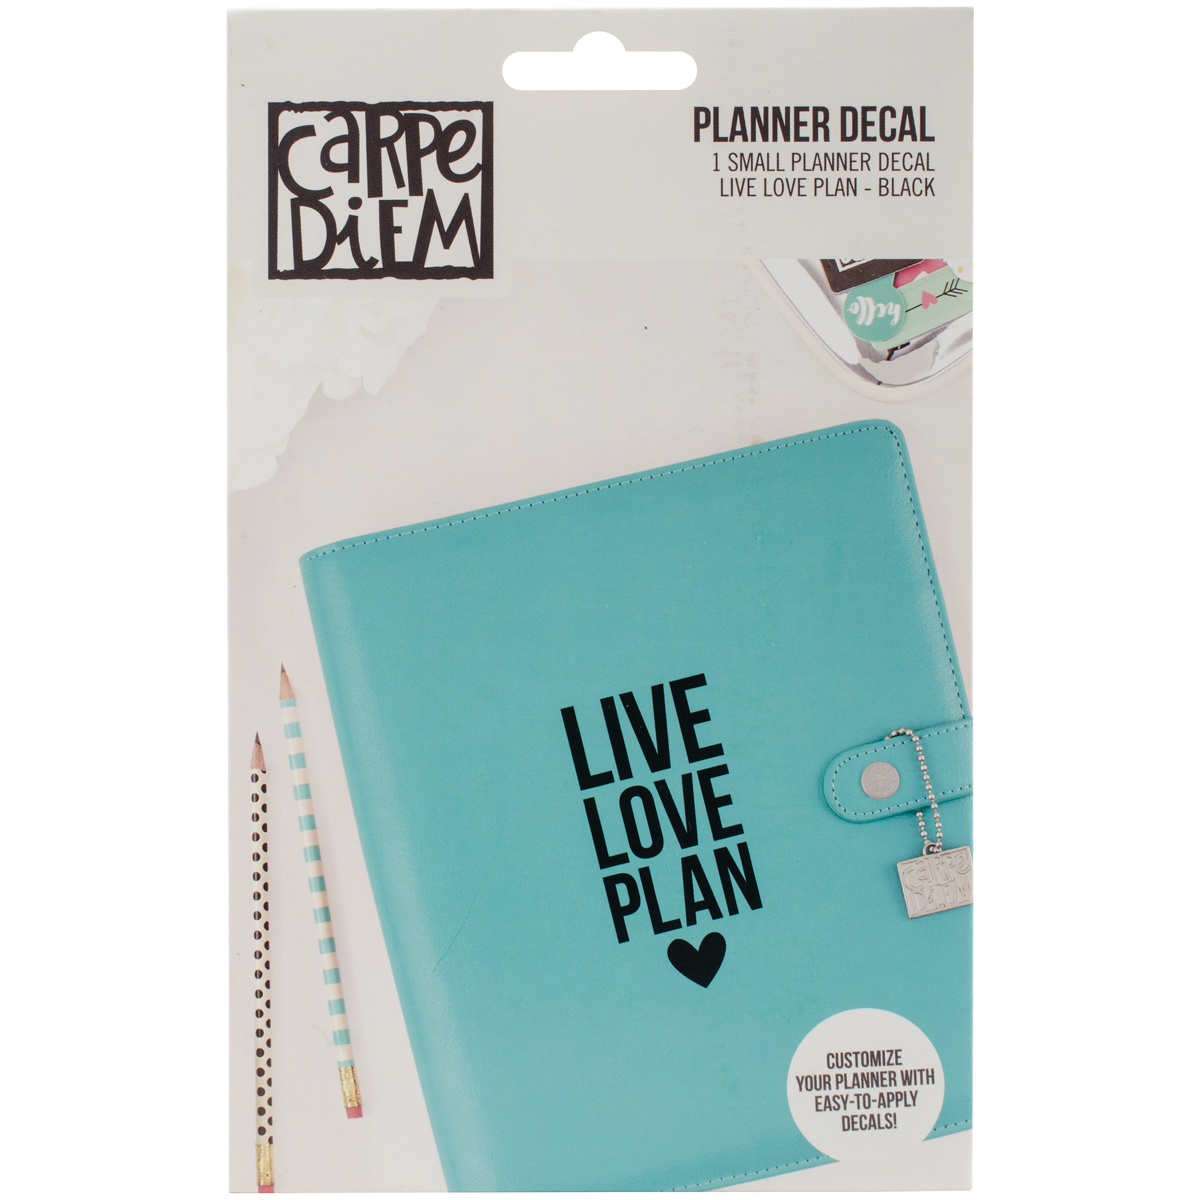 Carpe Diem live love plan decal